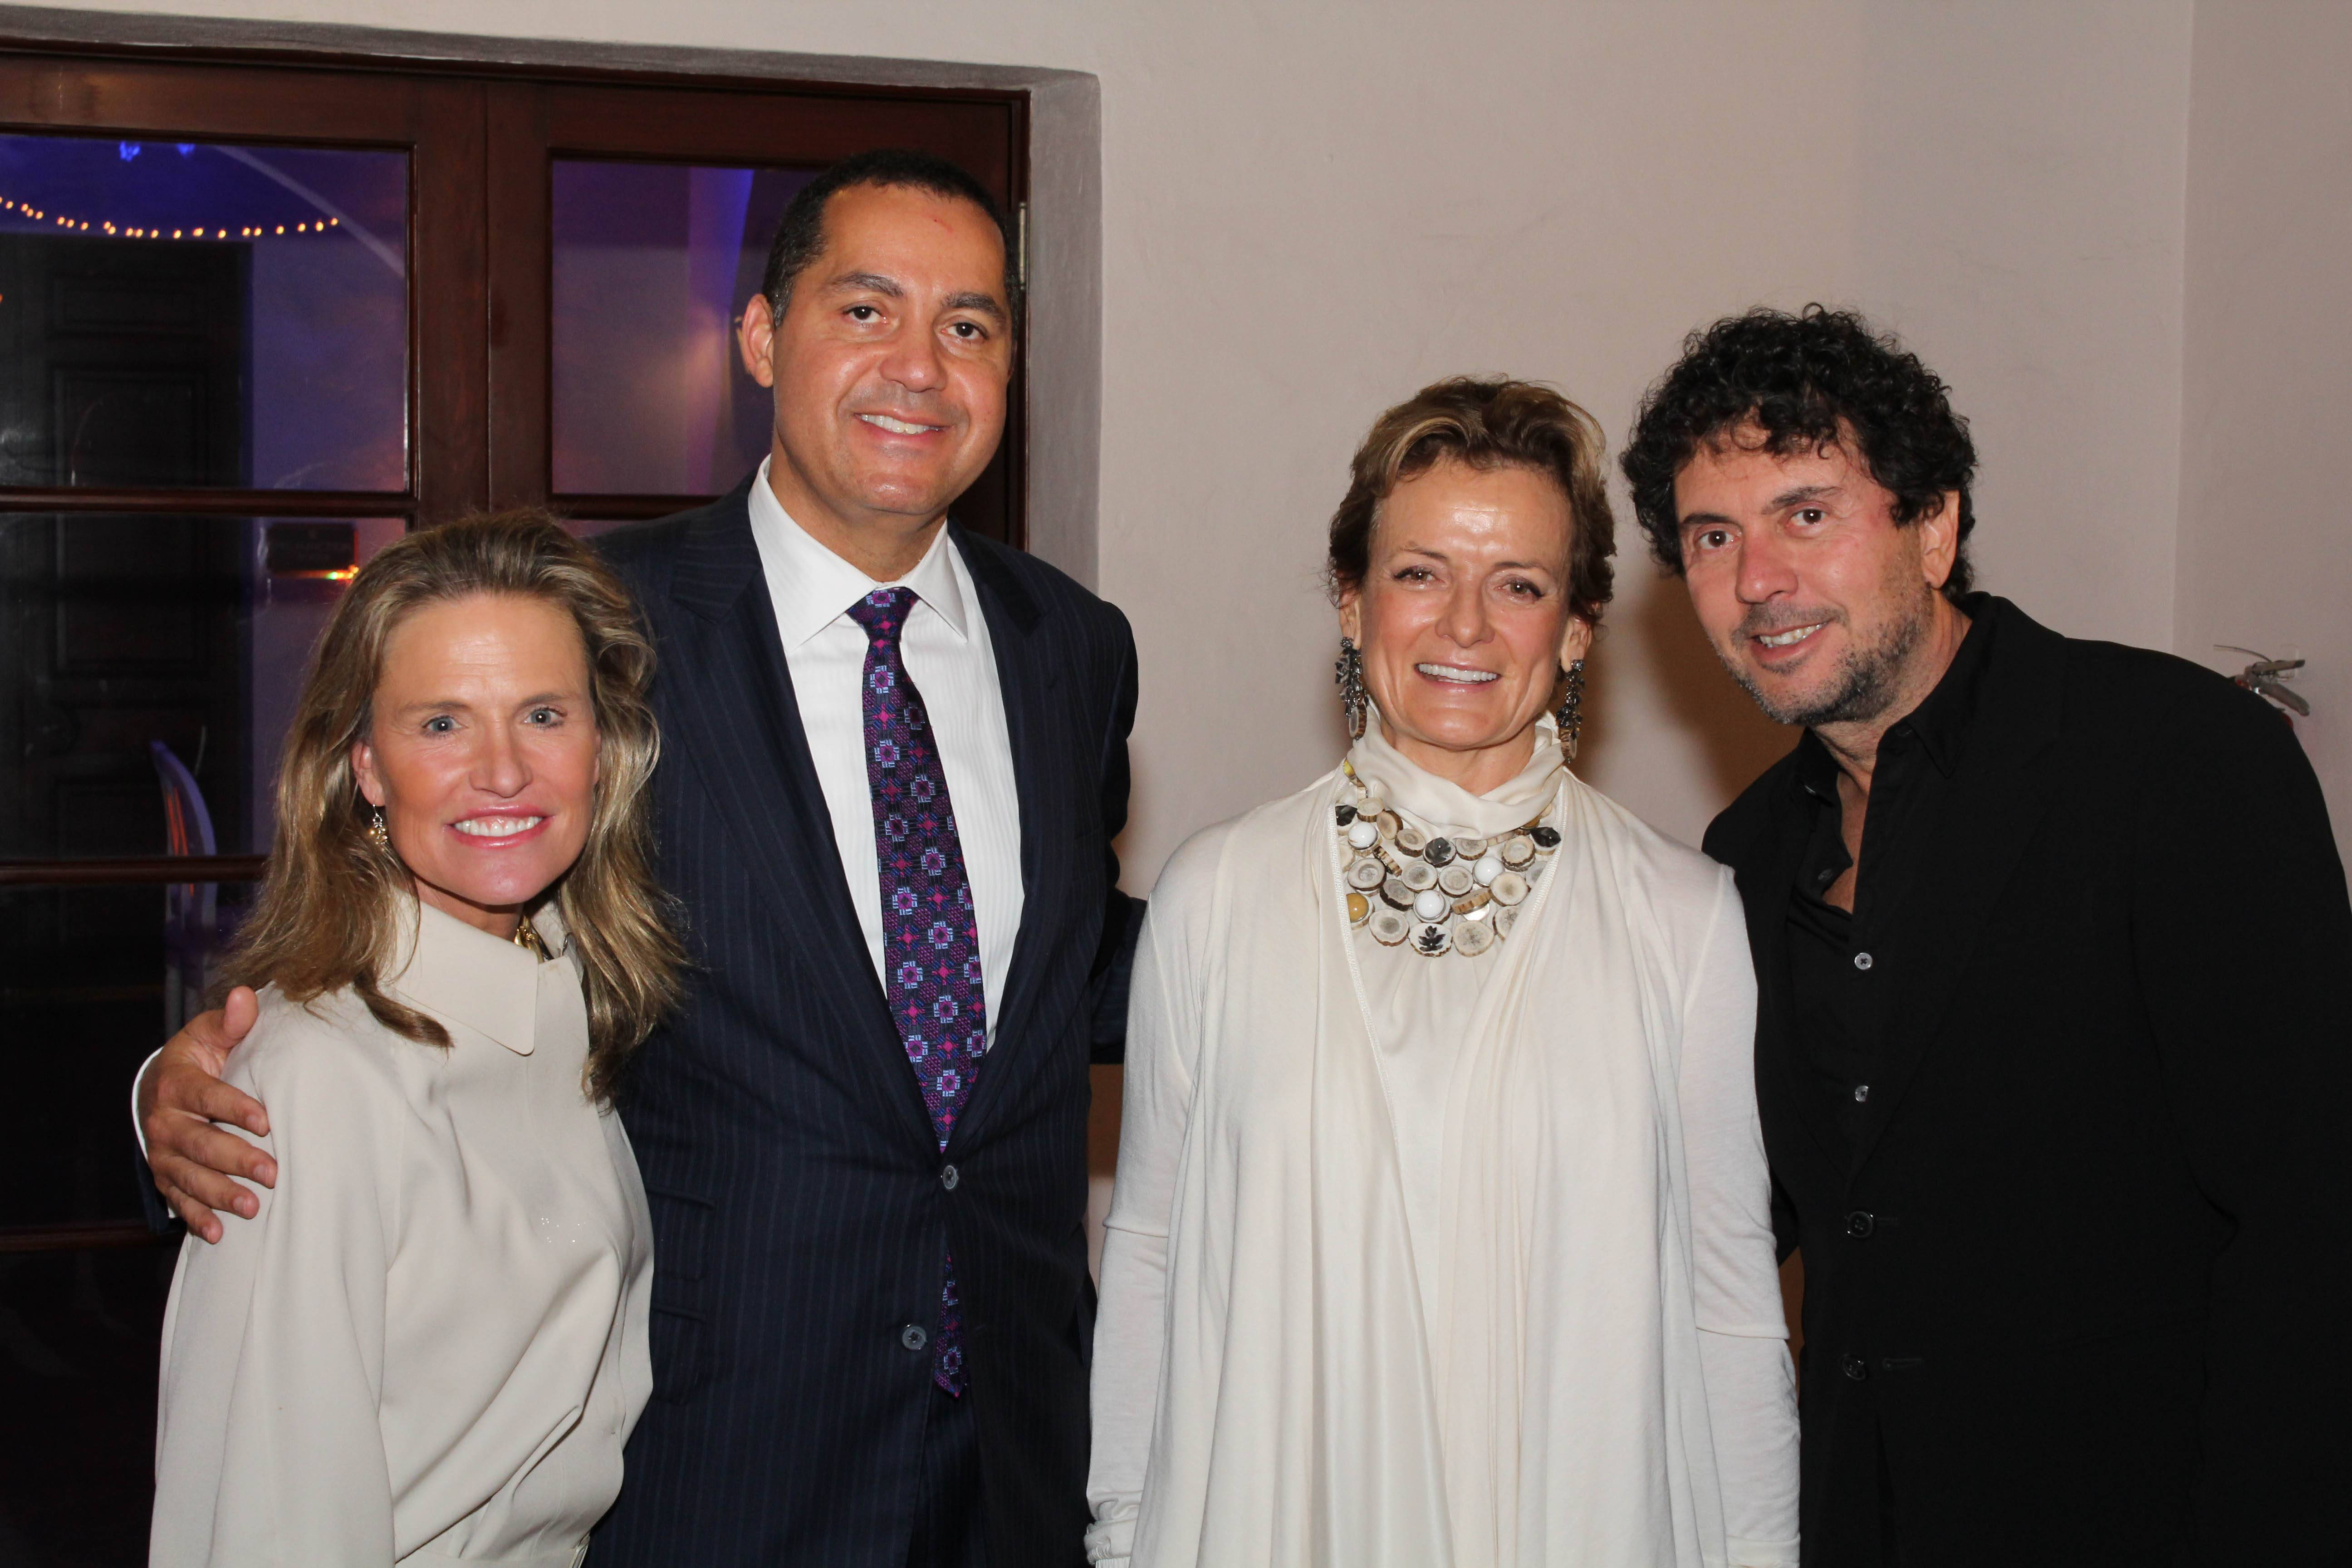 Jennifer Post, Don Peebles, Alexandra Champalimaud, Joao Armentano